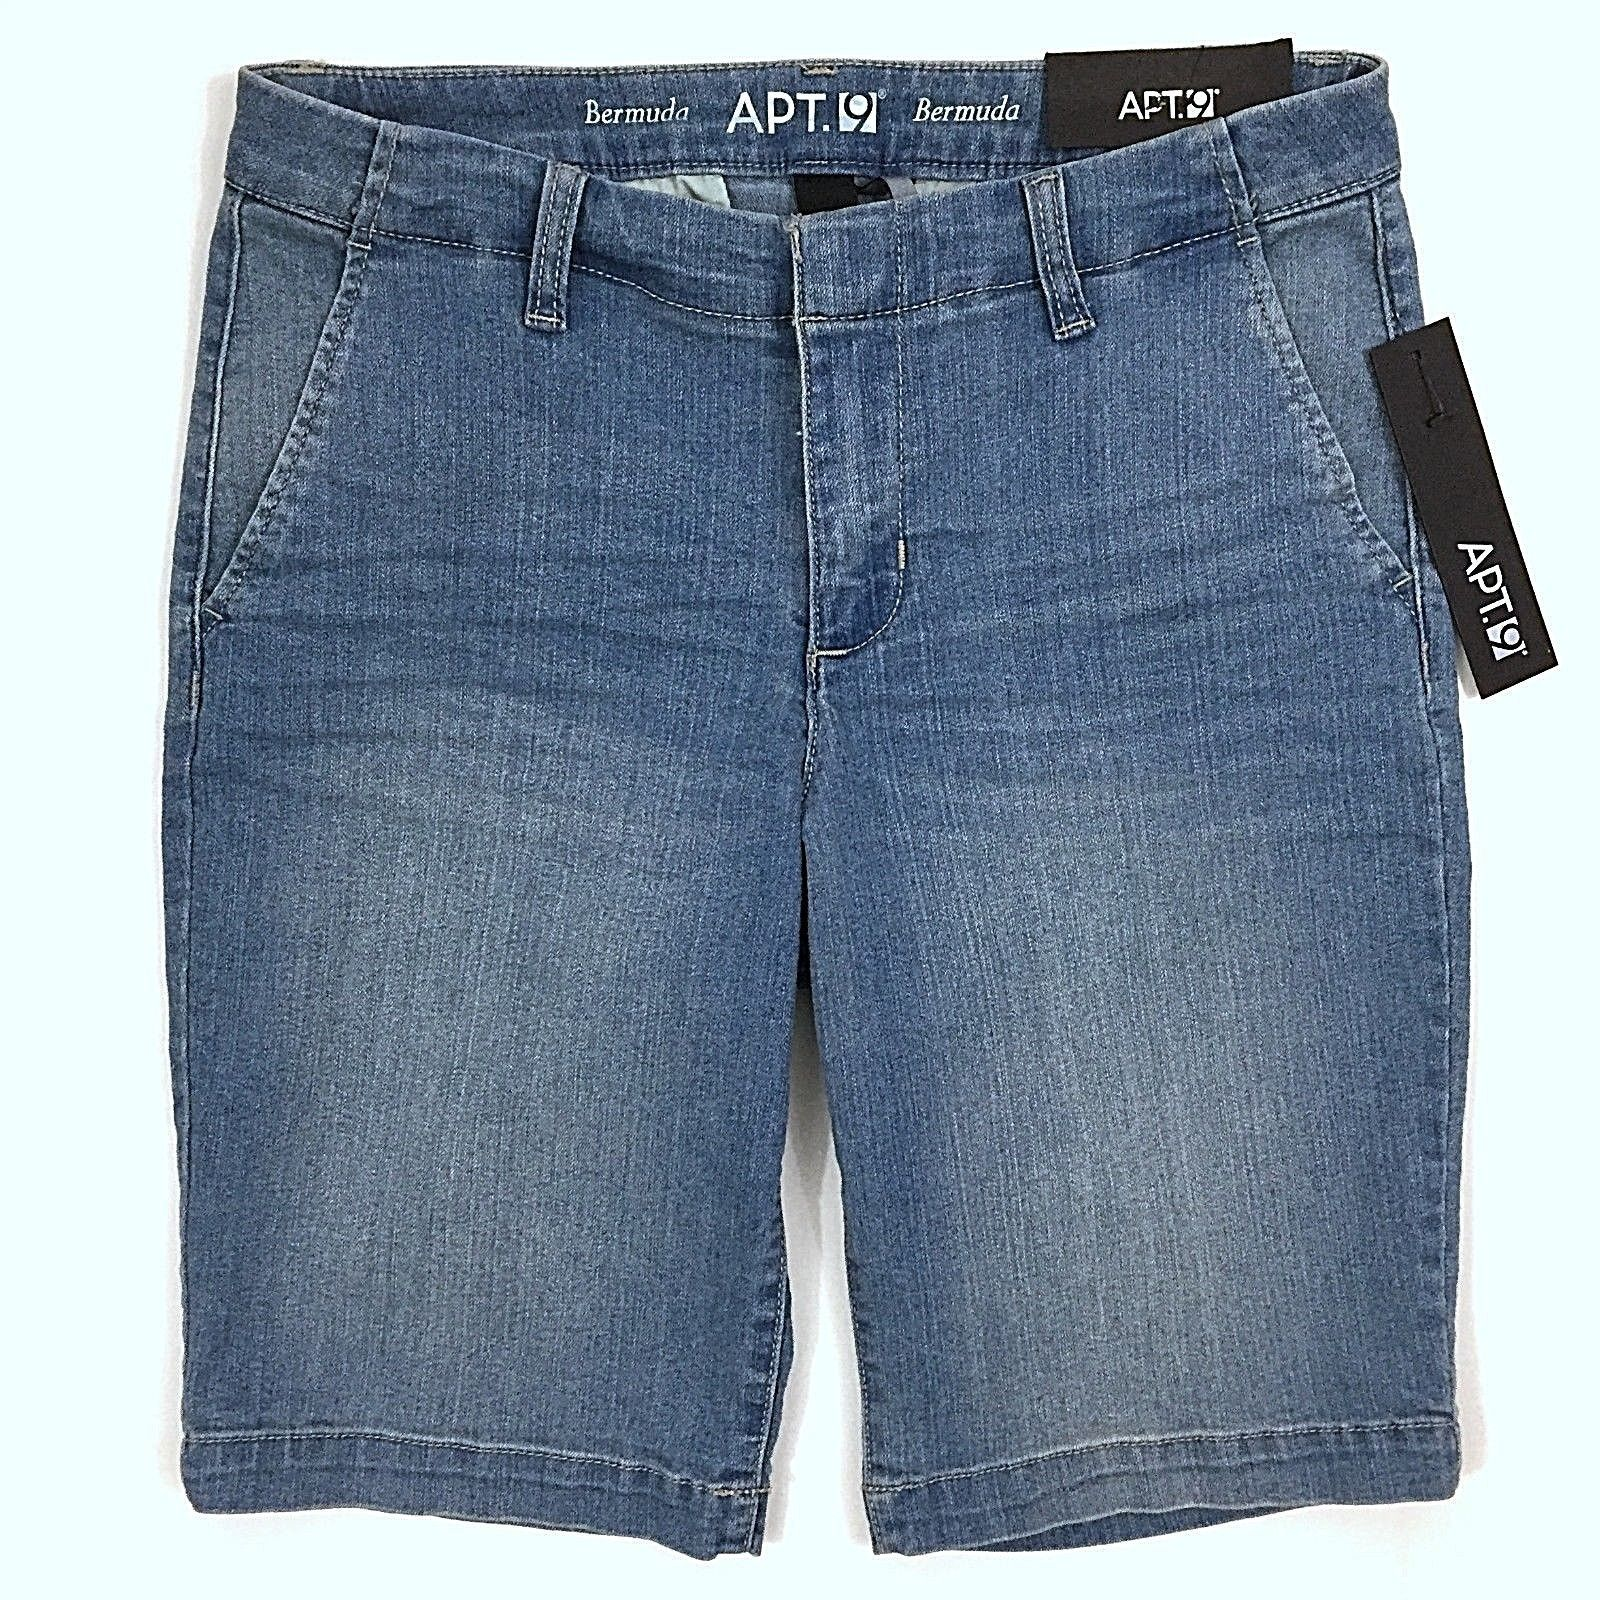 123d295090 Apt 9 Bermuda Jean Shorts Size 8 Blue Denim Cotton Blend Mid Rise 4 Pockets  -  15.83